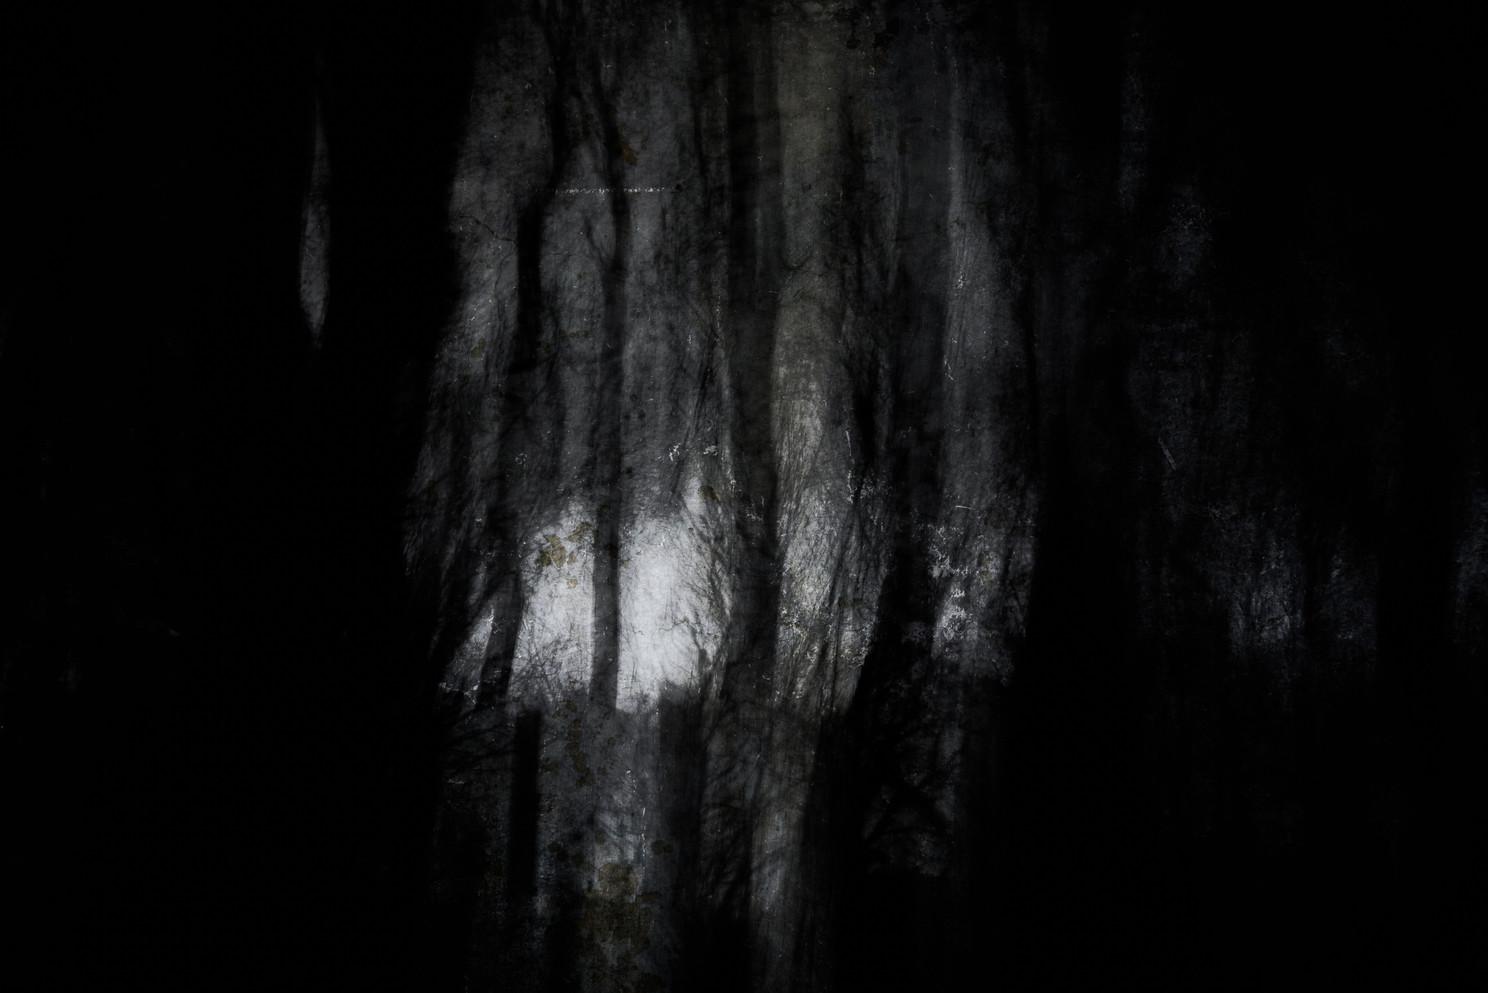 Creep (Copse) 013